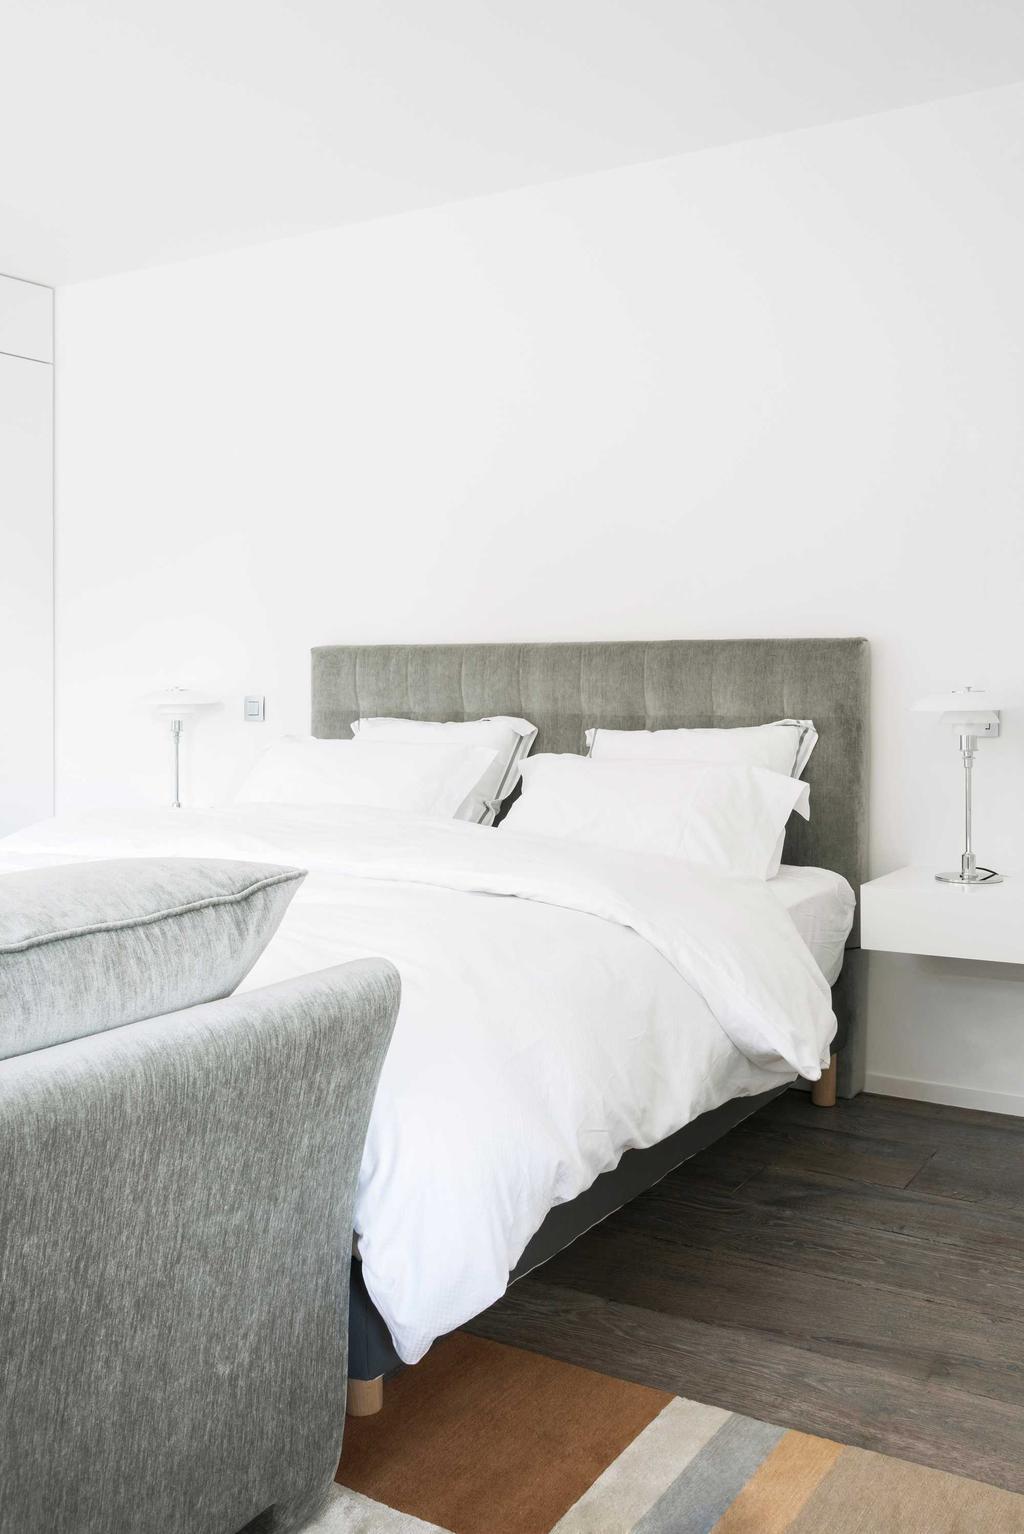 bed dekens slaapkamer